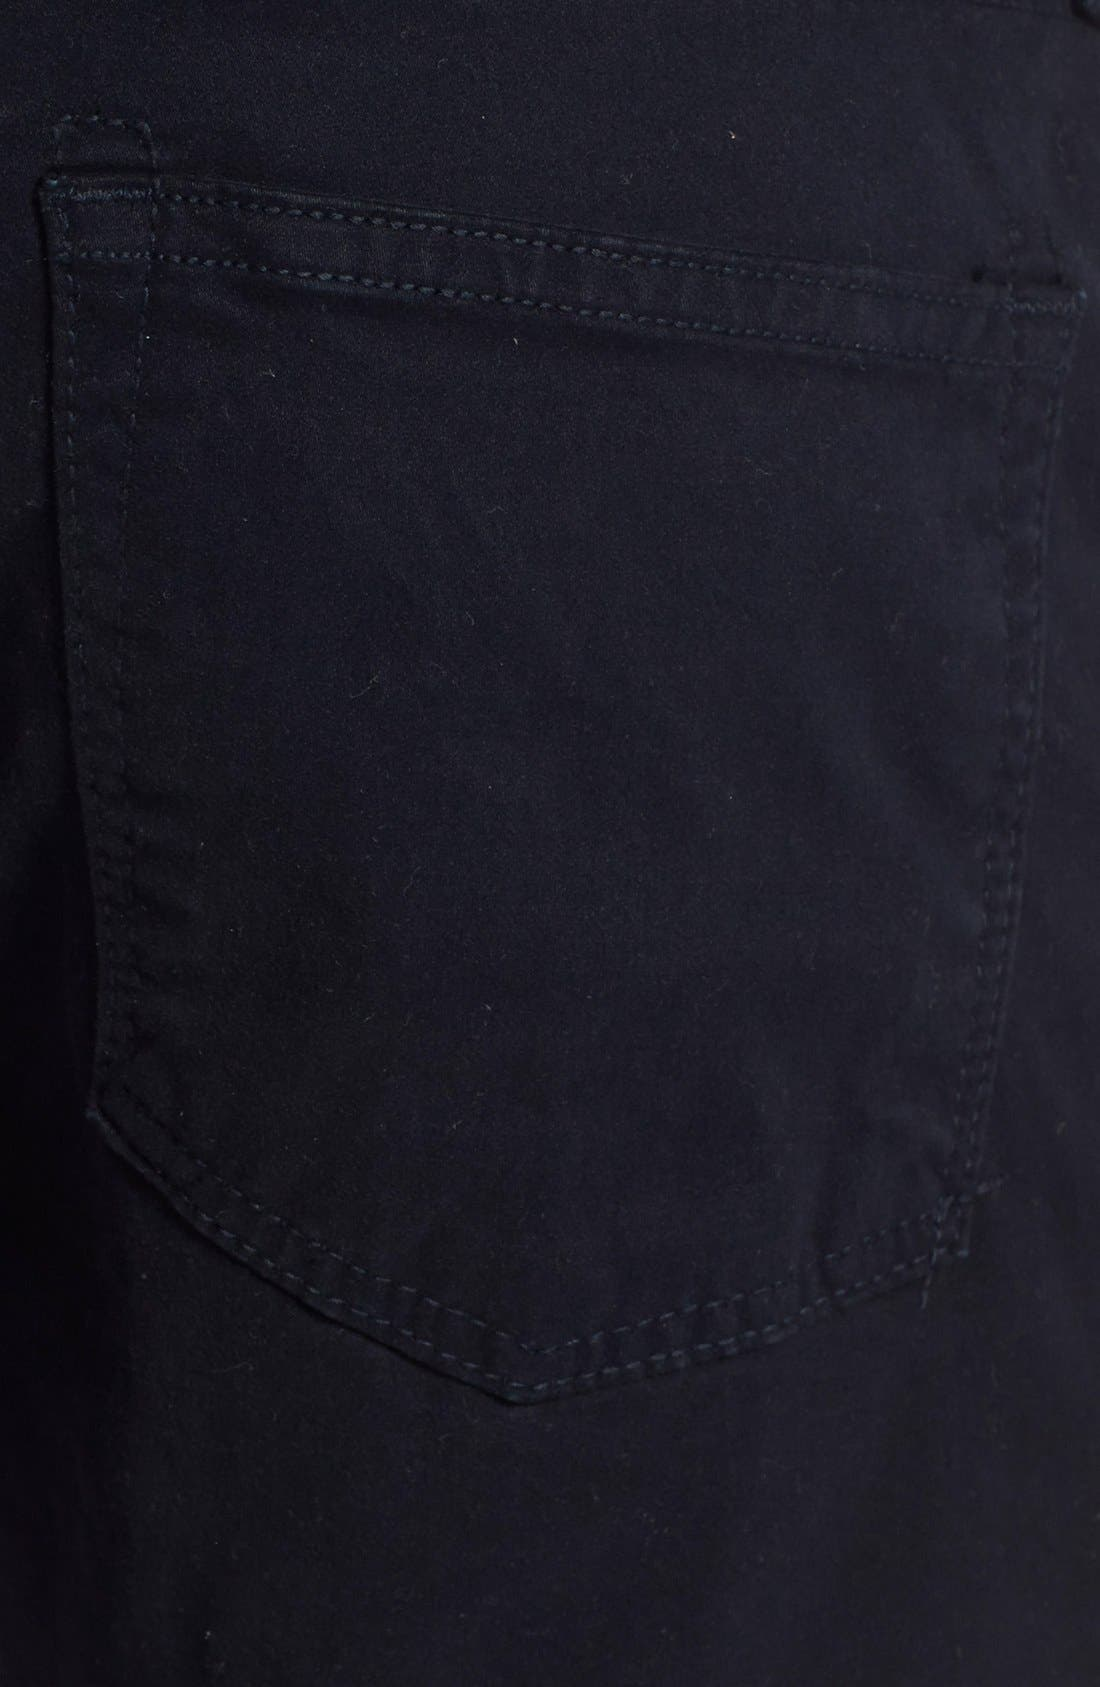 'Kane' Slim Fit Cotton Twill Pants,                             Alternate thumbnail 55, color,